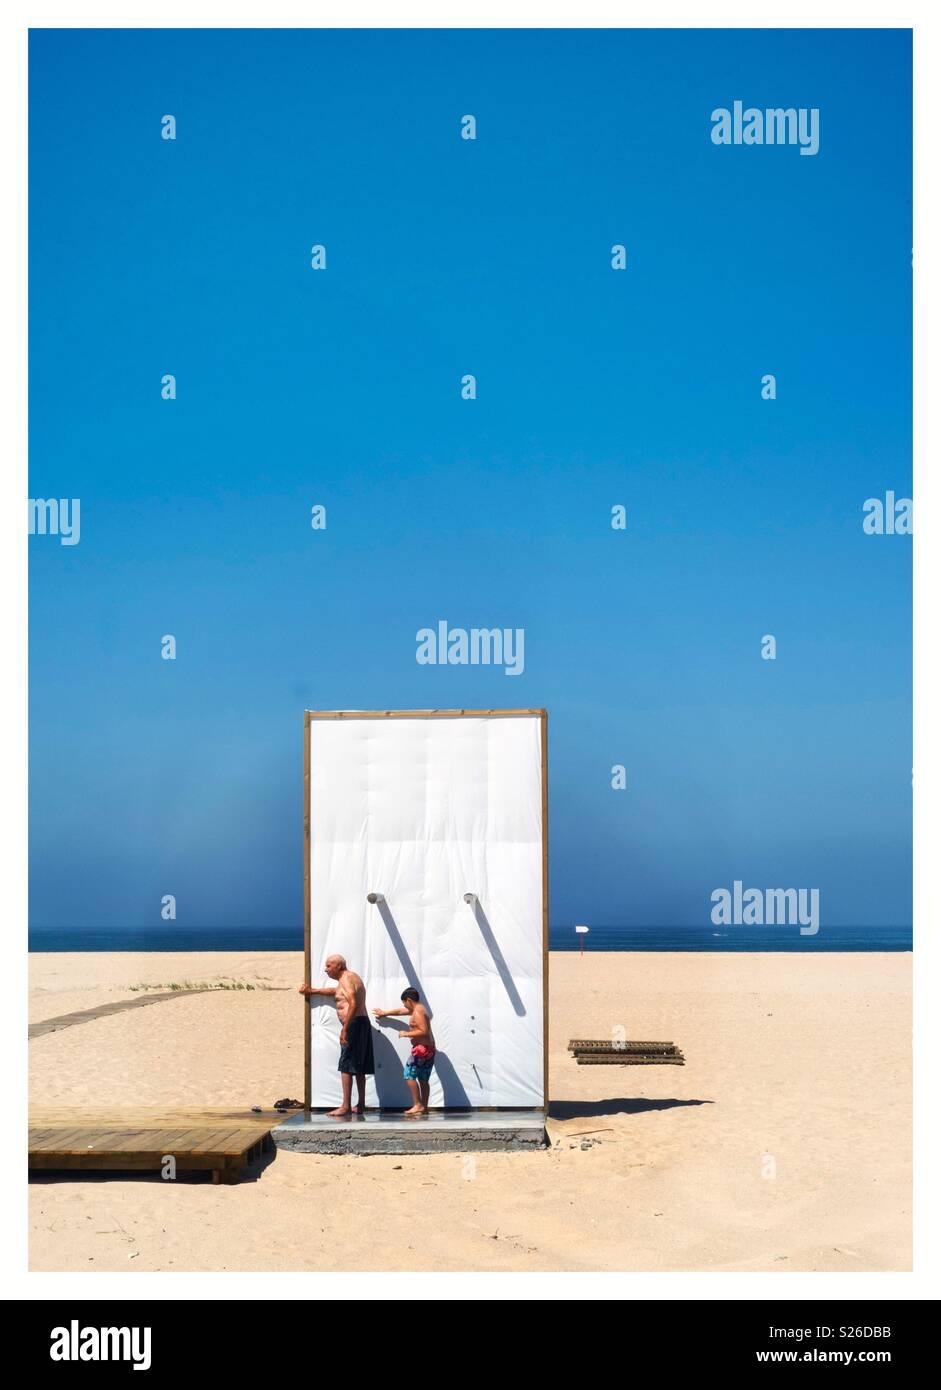 #Portugal ## FigueiradaFoz Küste #Love# Strand #Sommer #Fun# Oldman #Kind # Junge # Kontrast # Licht # Schatten Stockbild